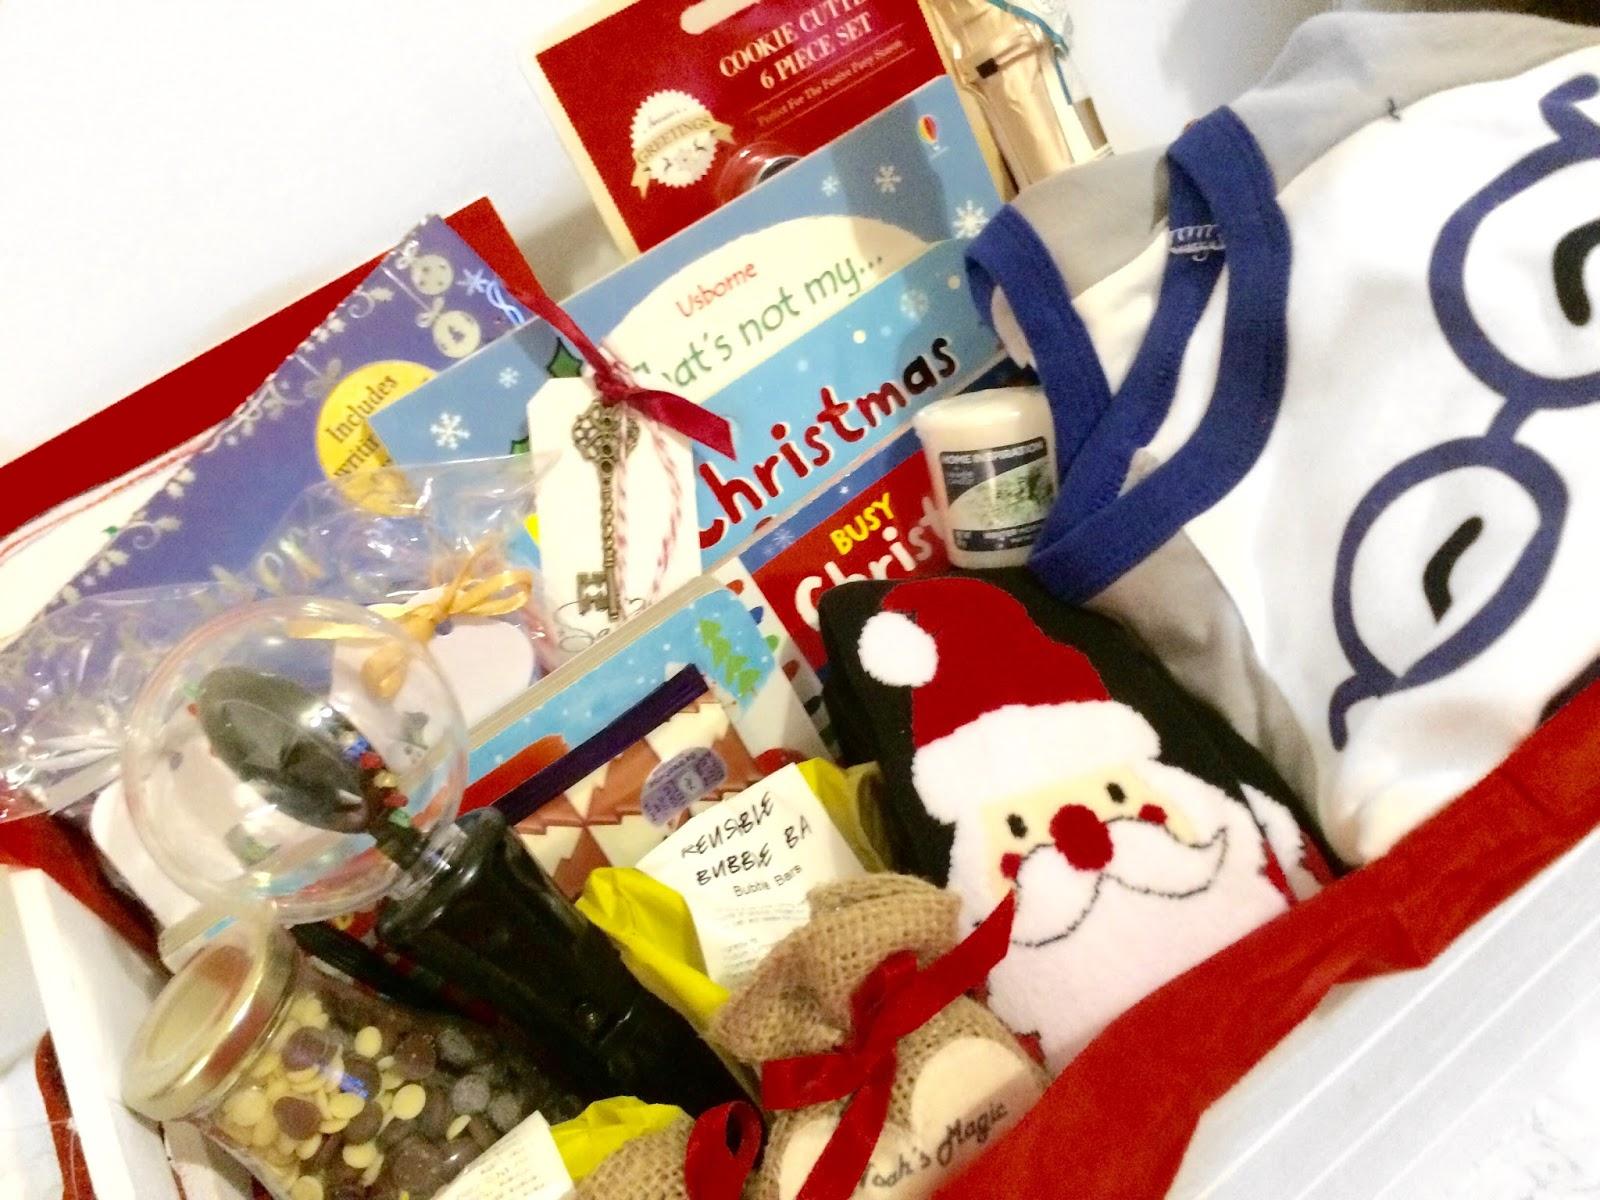 Blogmas 13 Our Christmas Eve Box